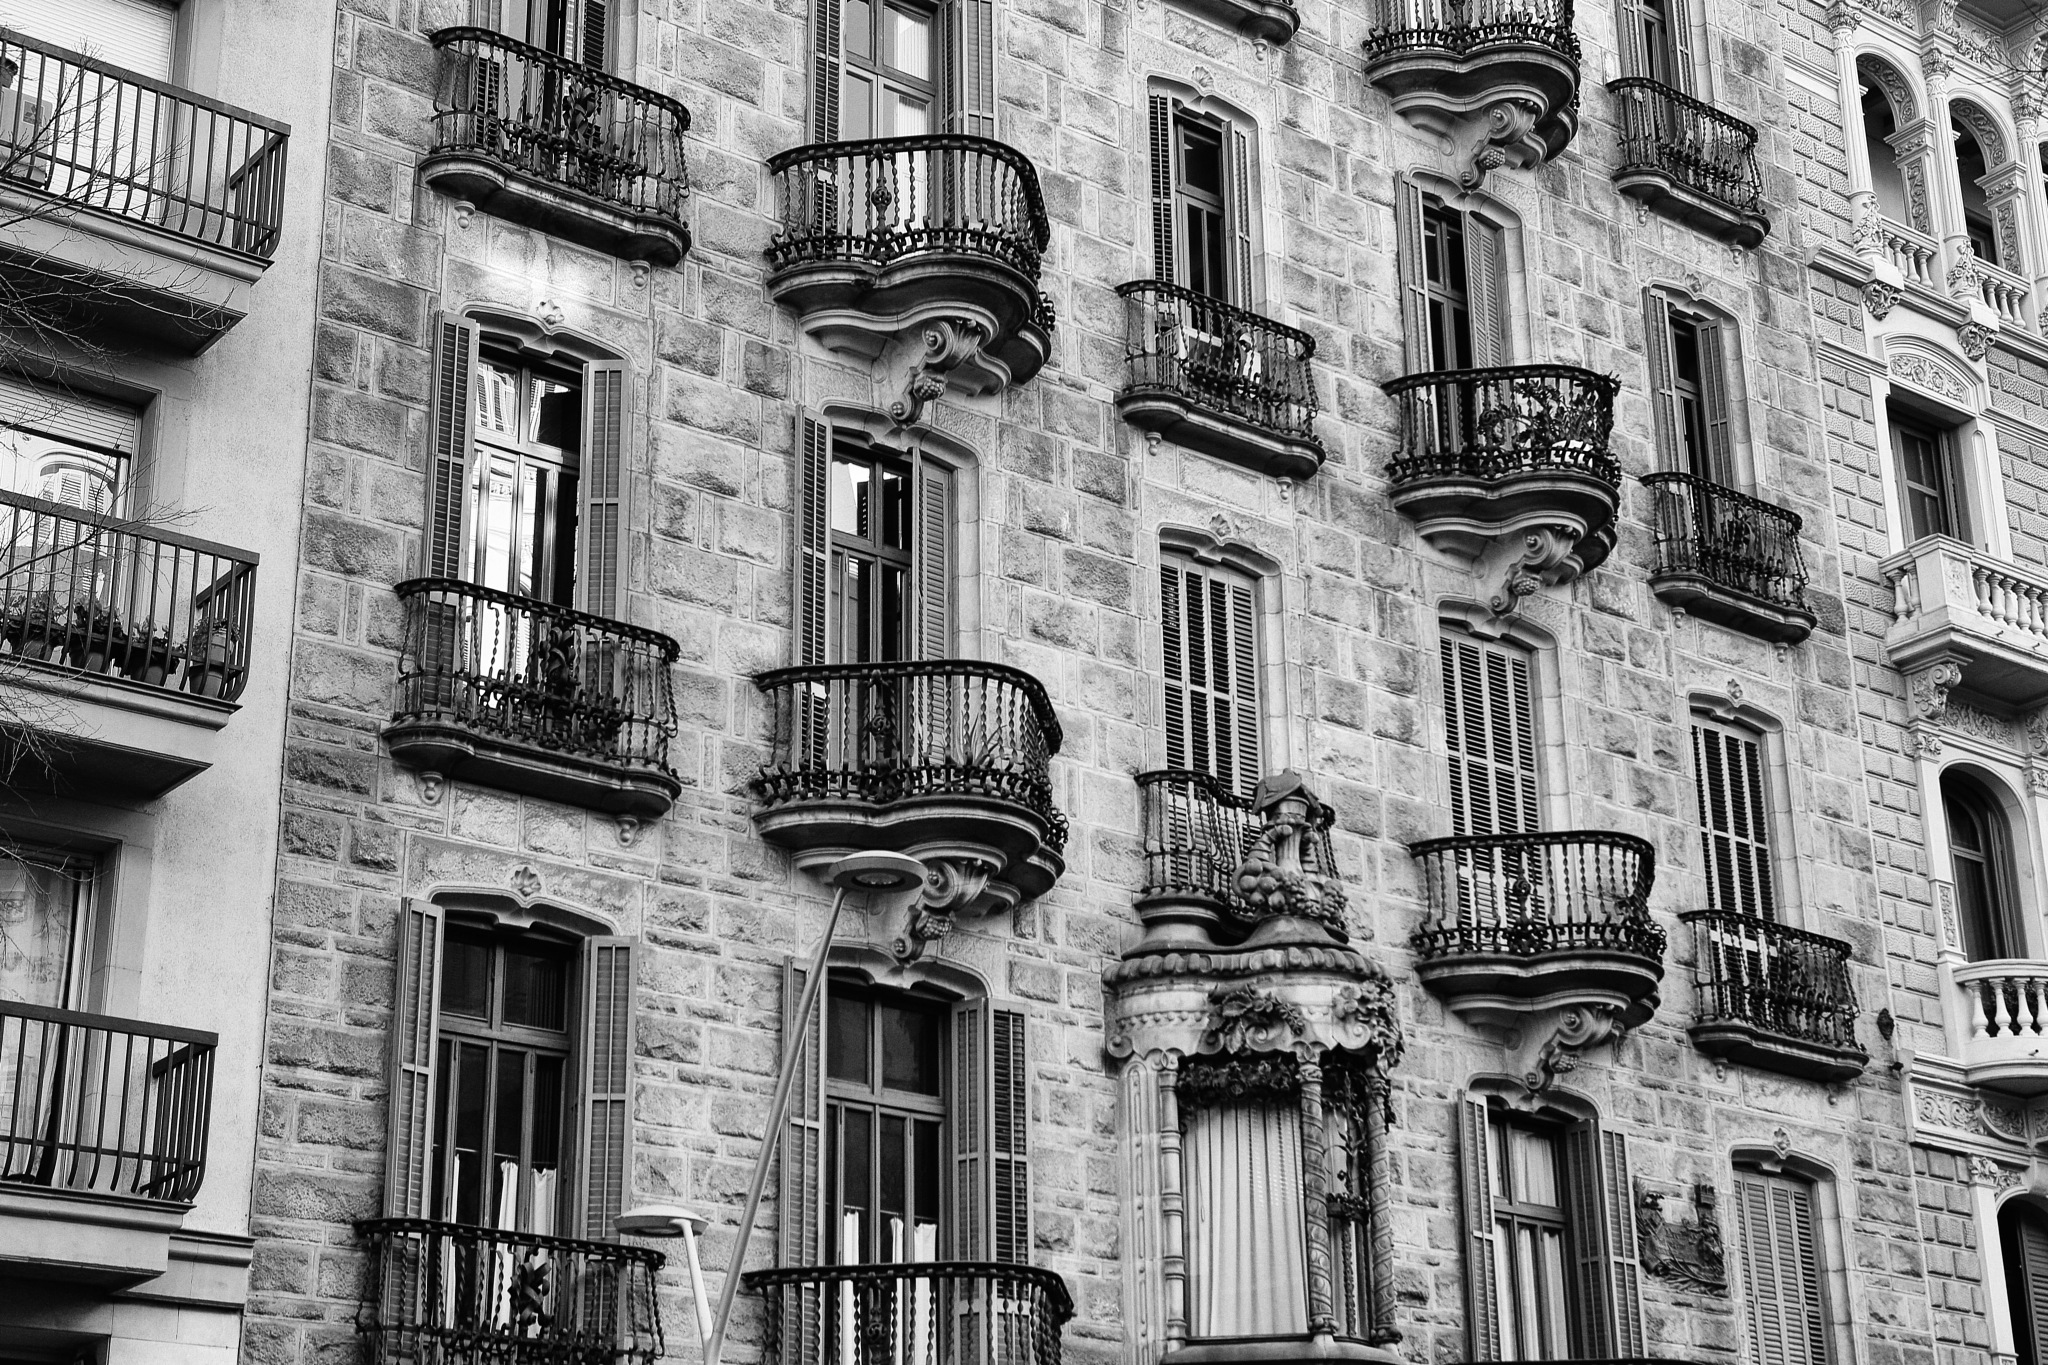 Balcony by leecj0129